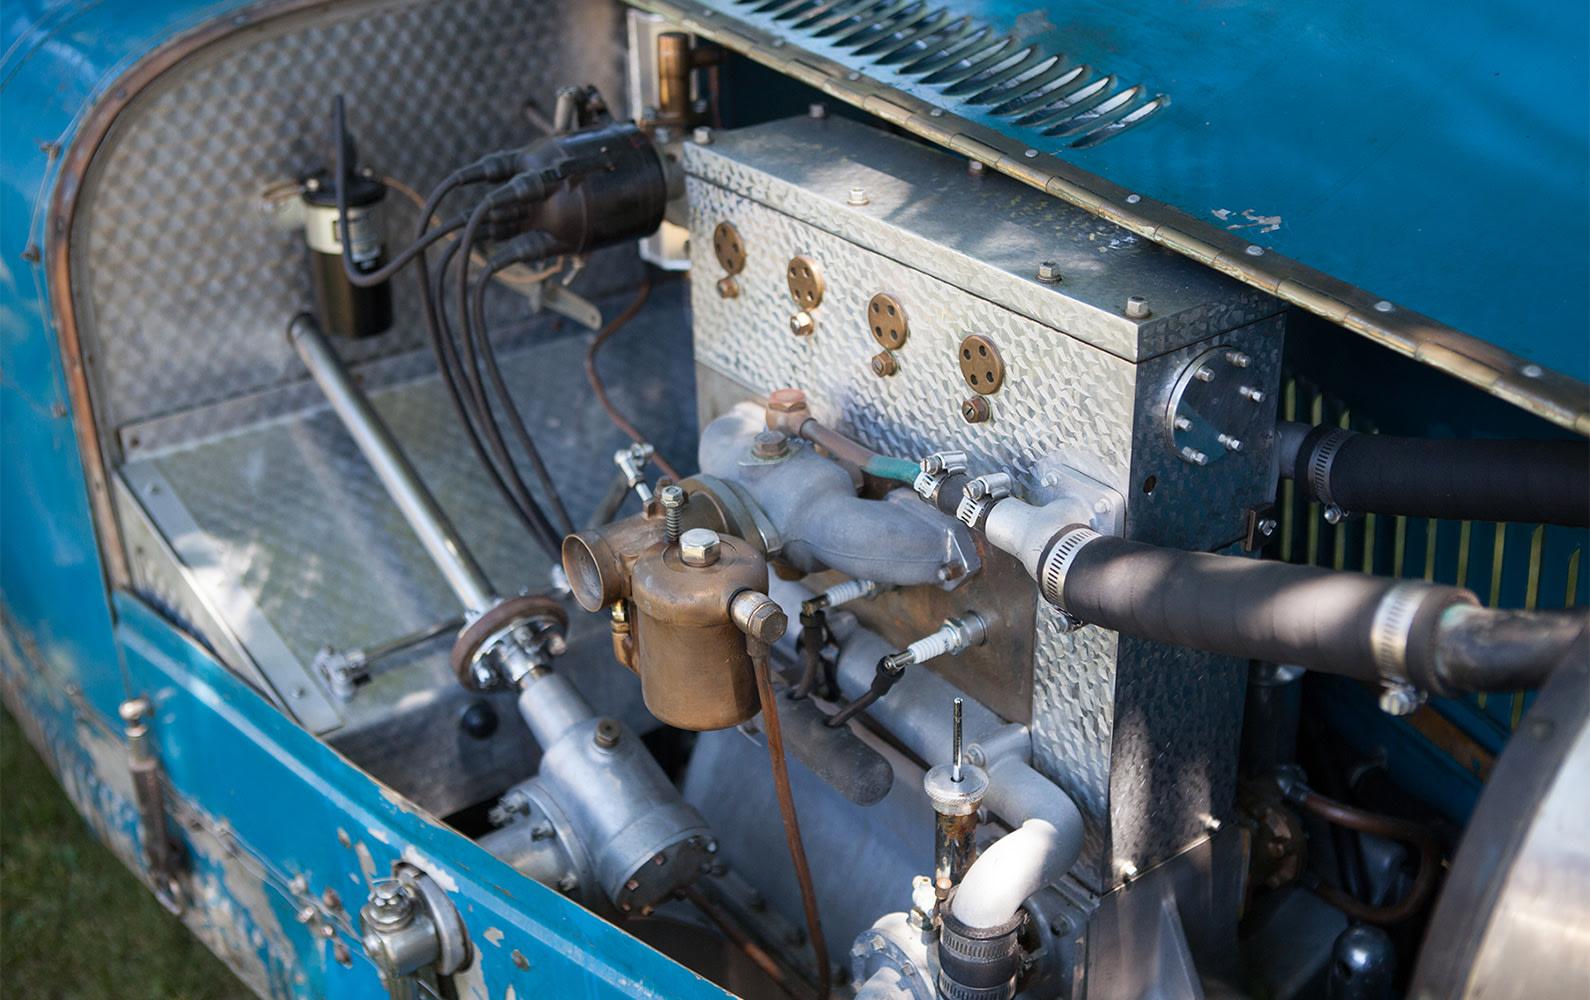 1926 Bugatti Type 37 Grand Prix engine